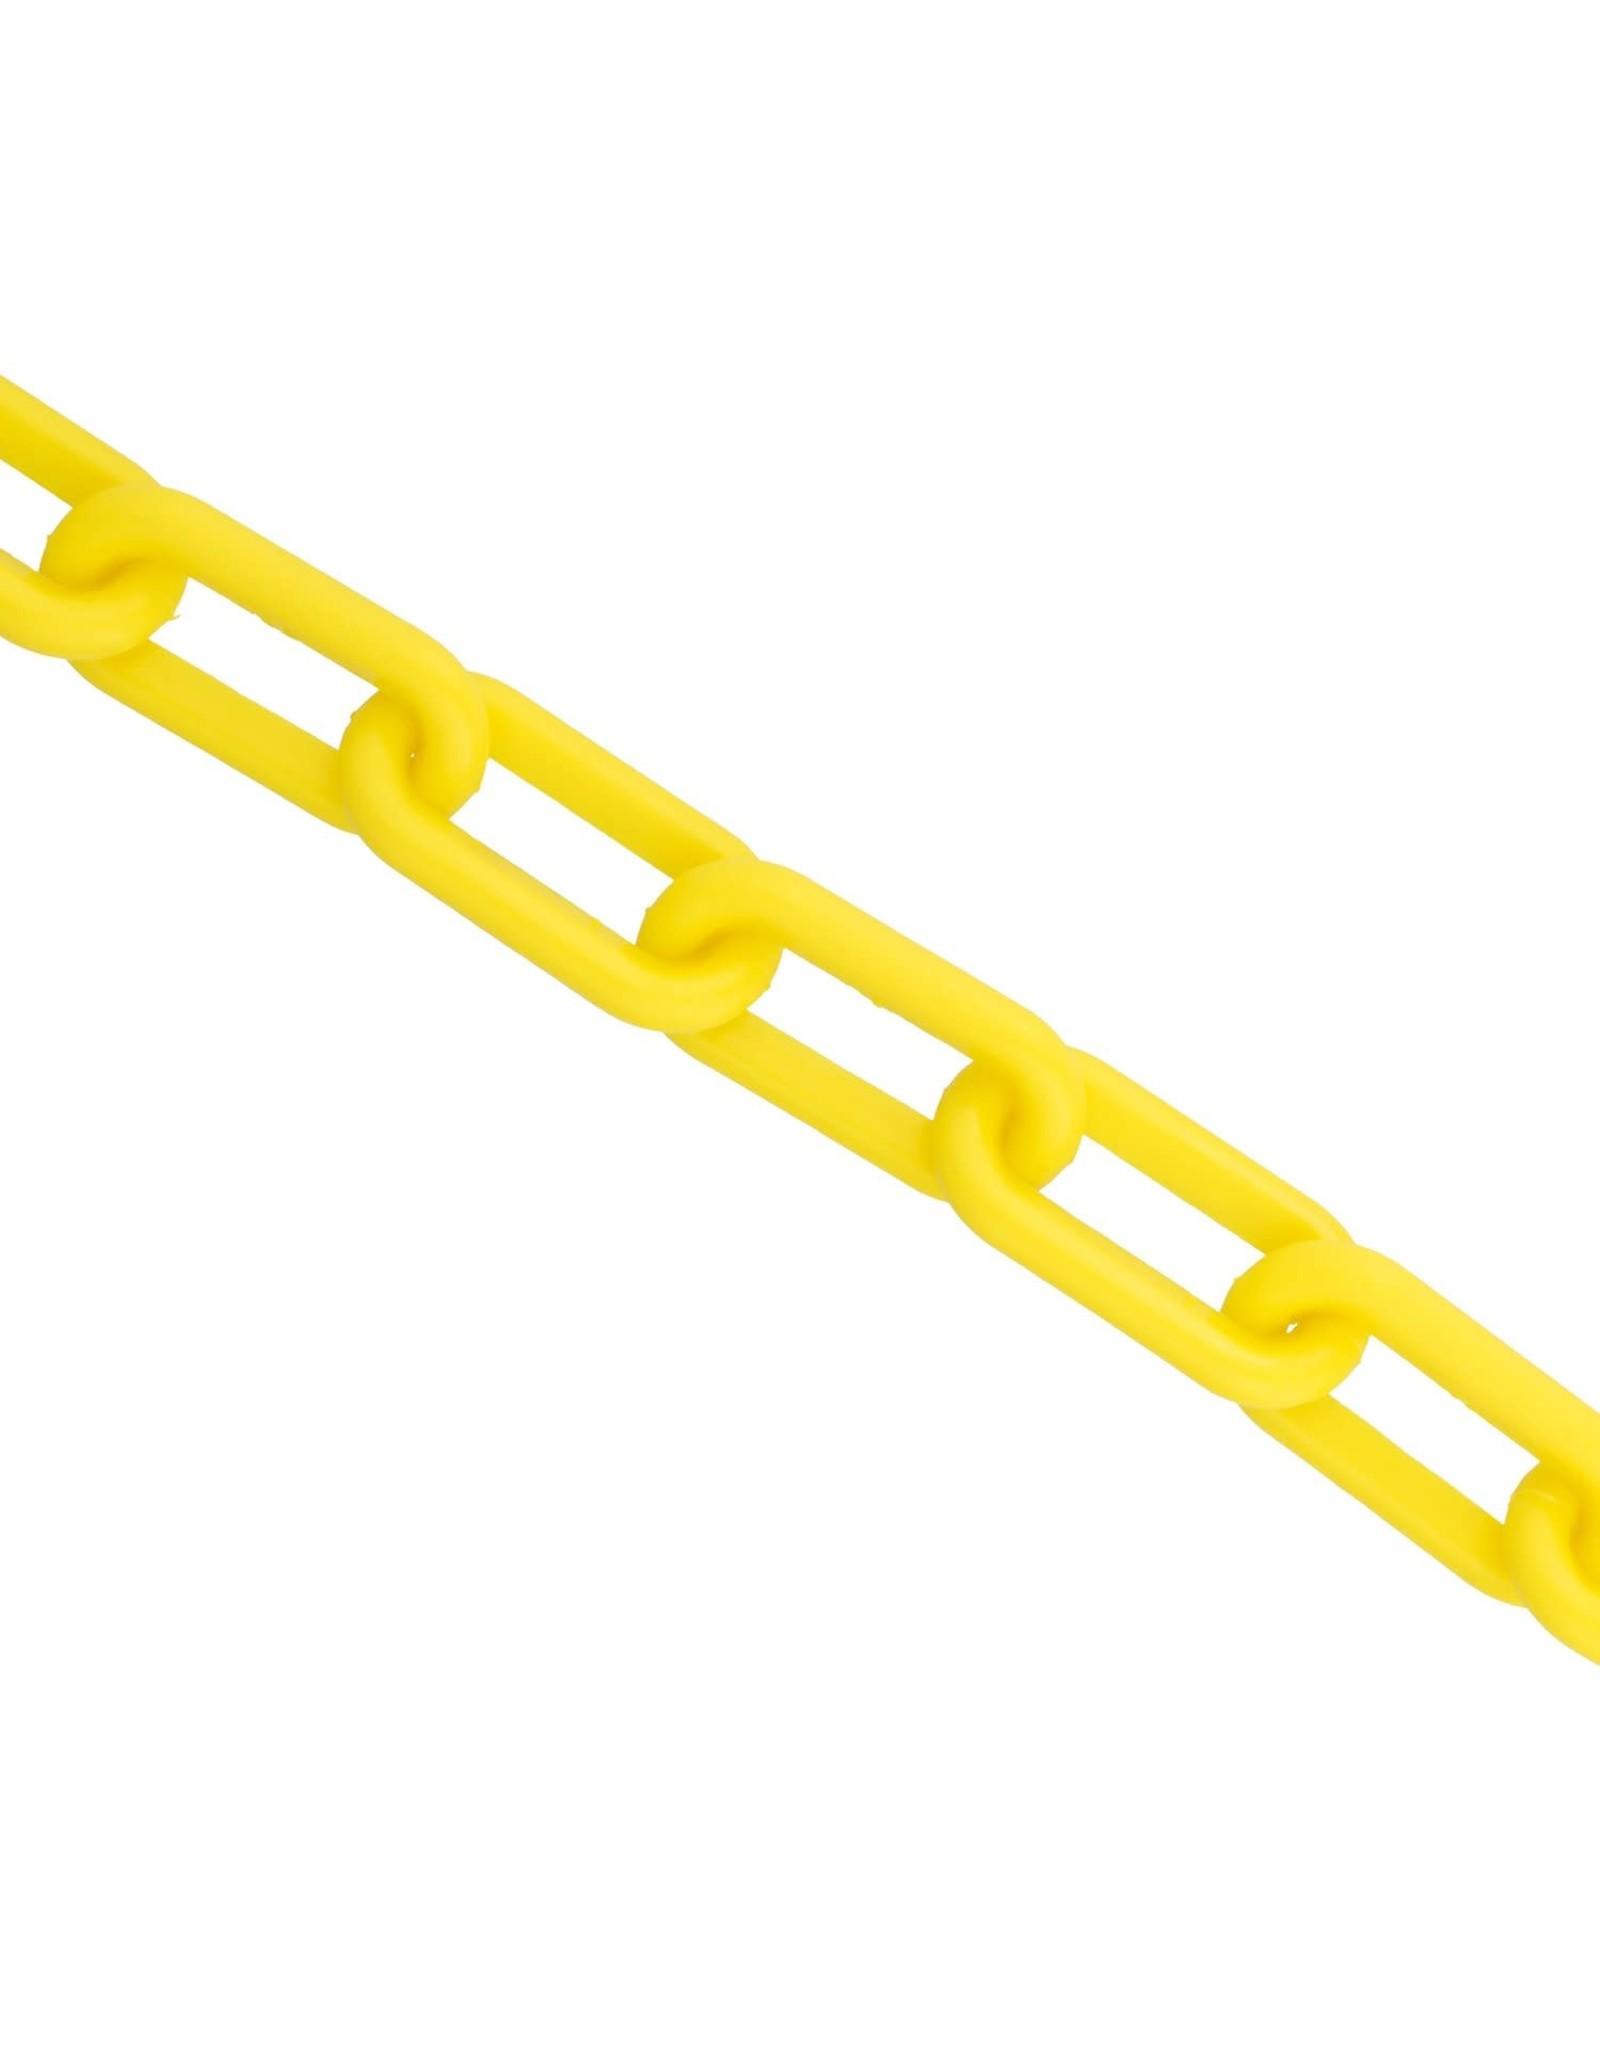 Plastic Chain Link 125 ft